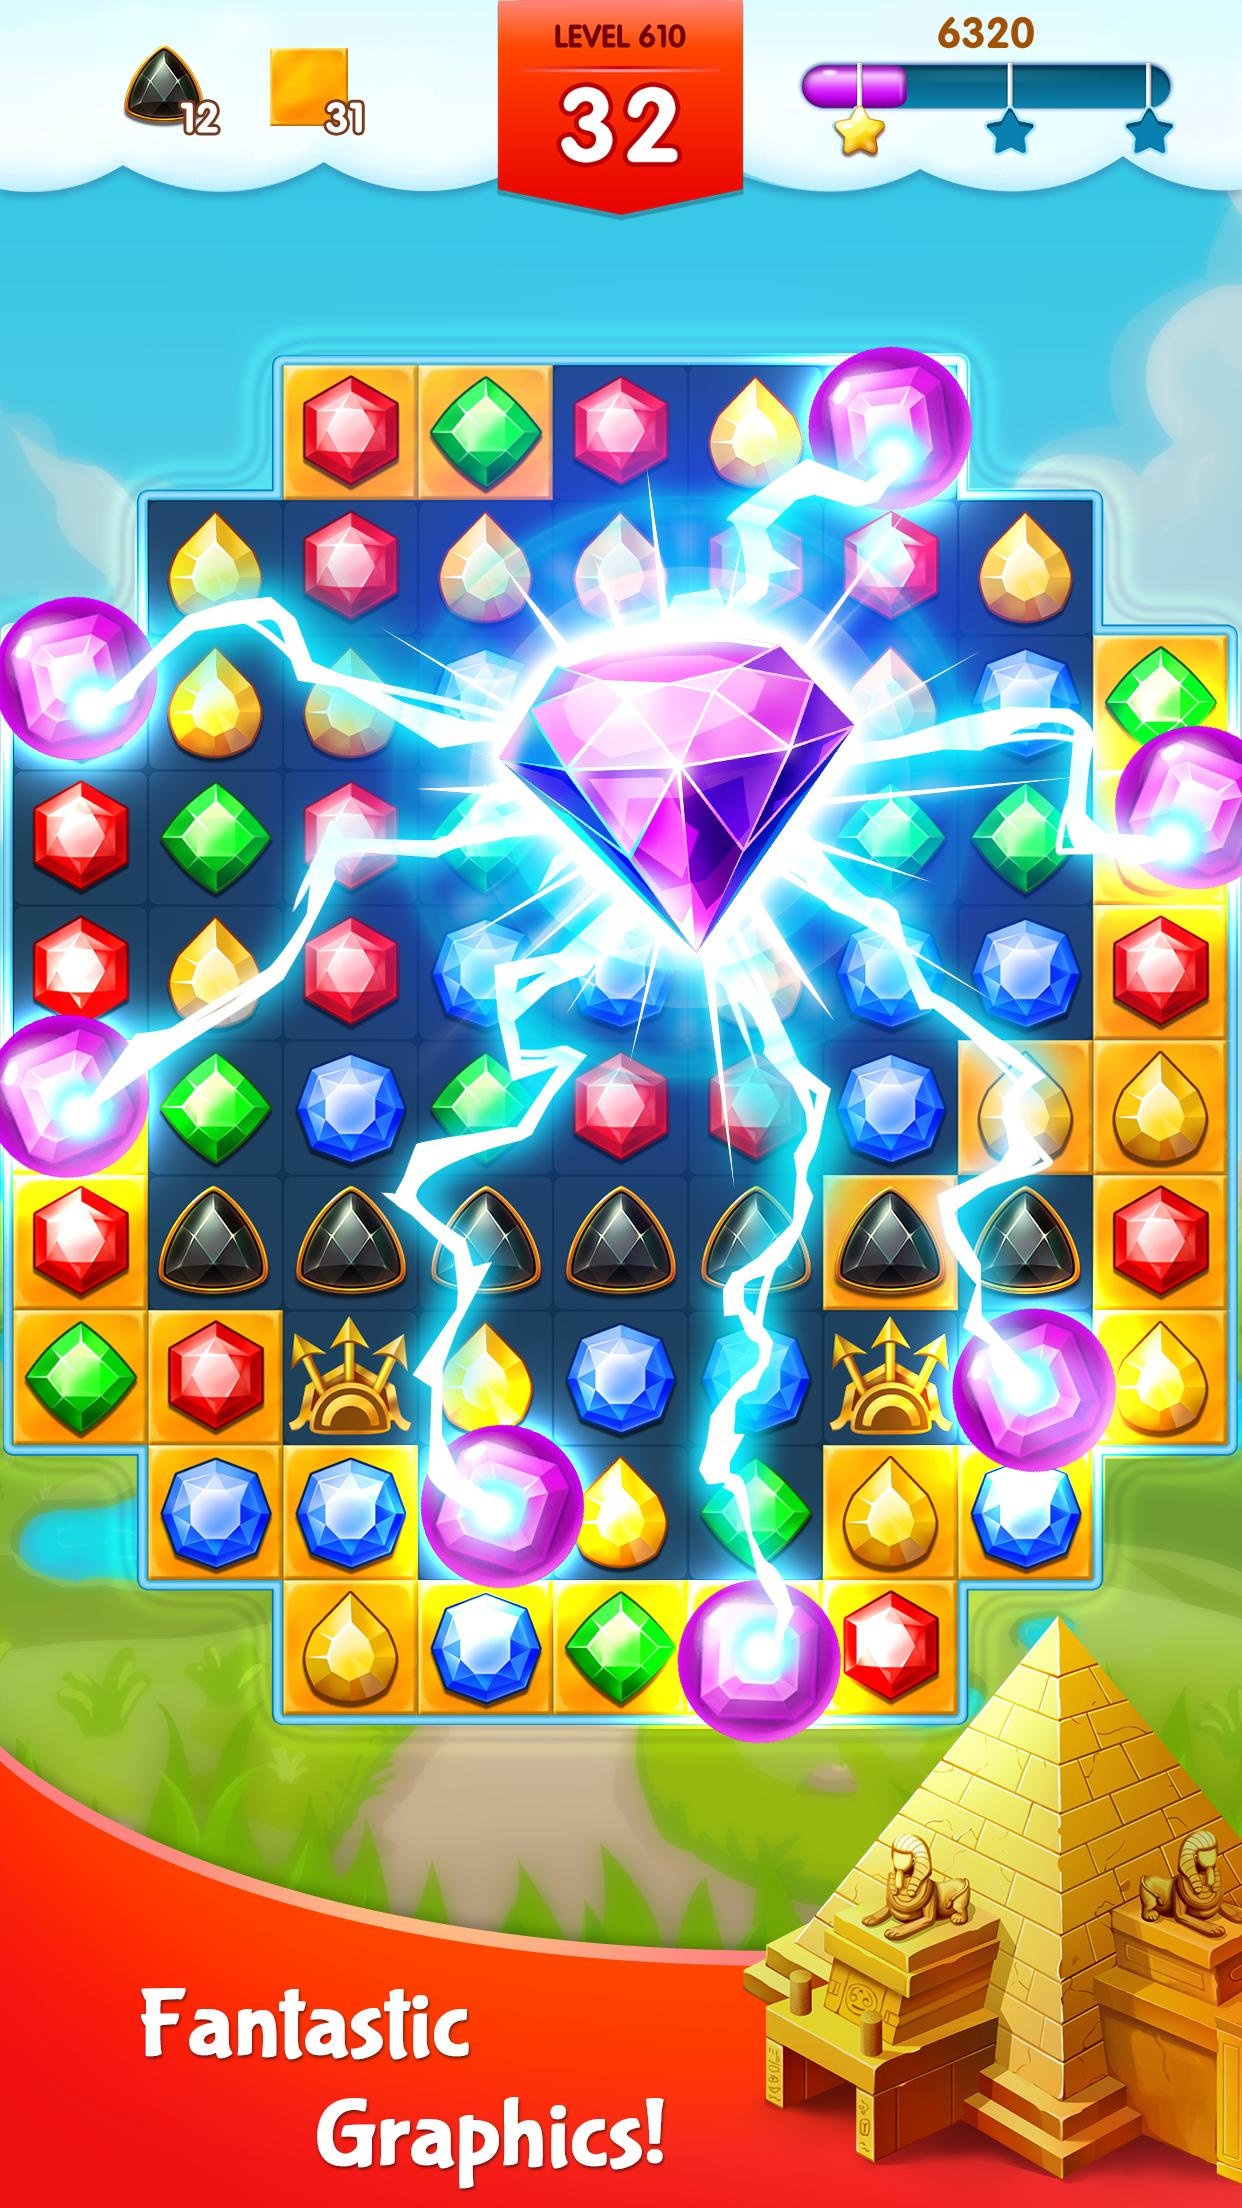 Jewels Legend - Match 3 Puzzle 2.33.3 Screenshot 11